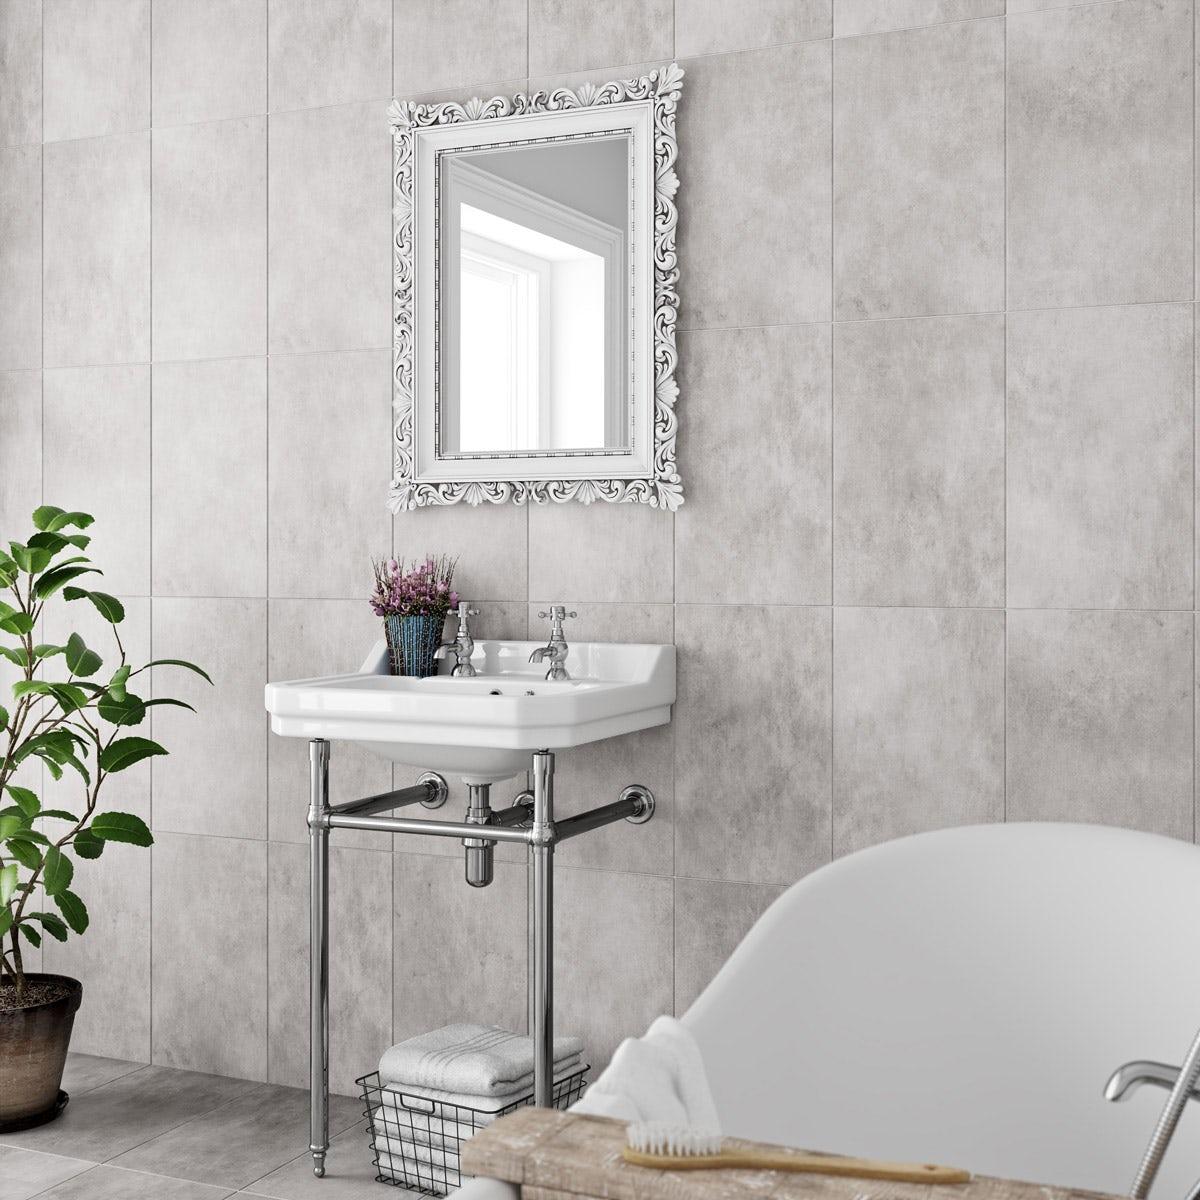 laura ashley bathroom tiles